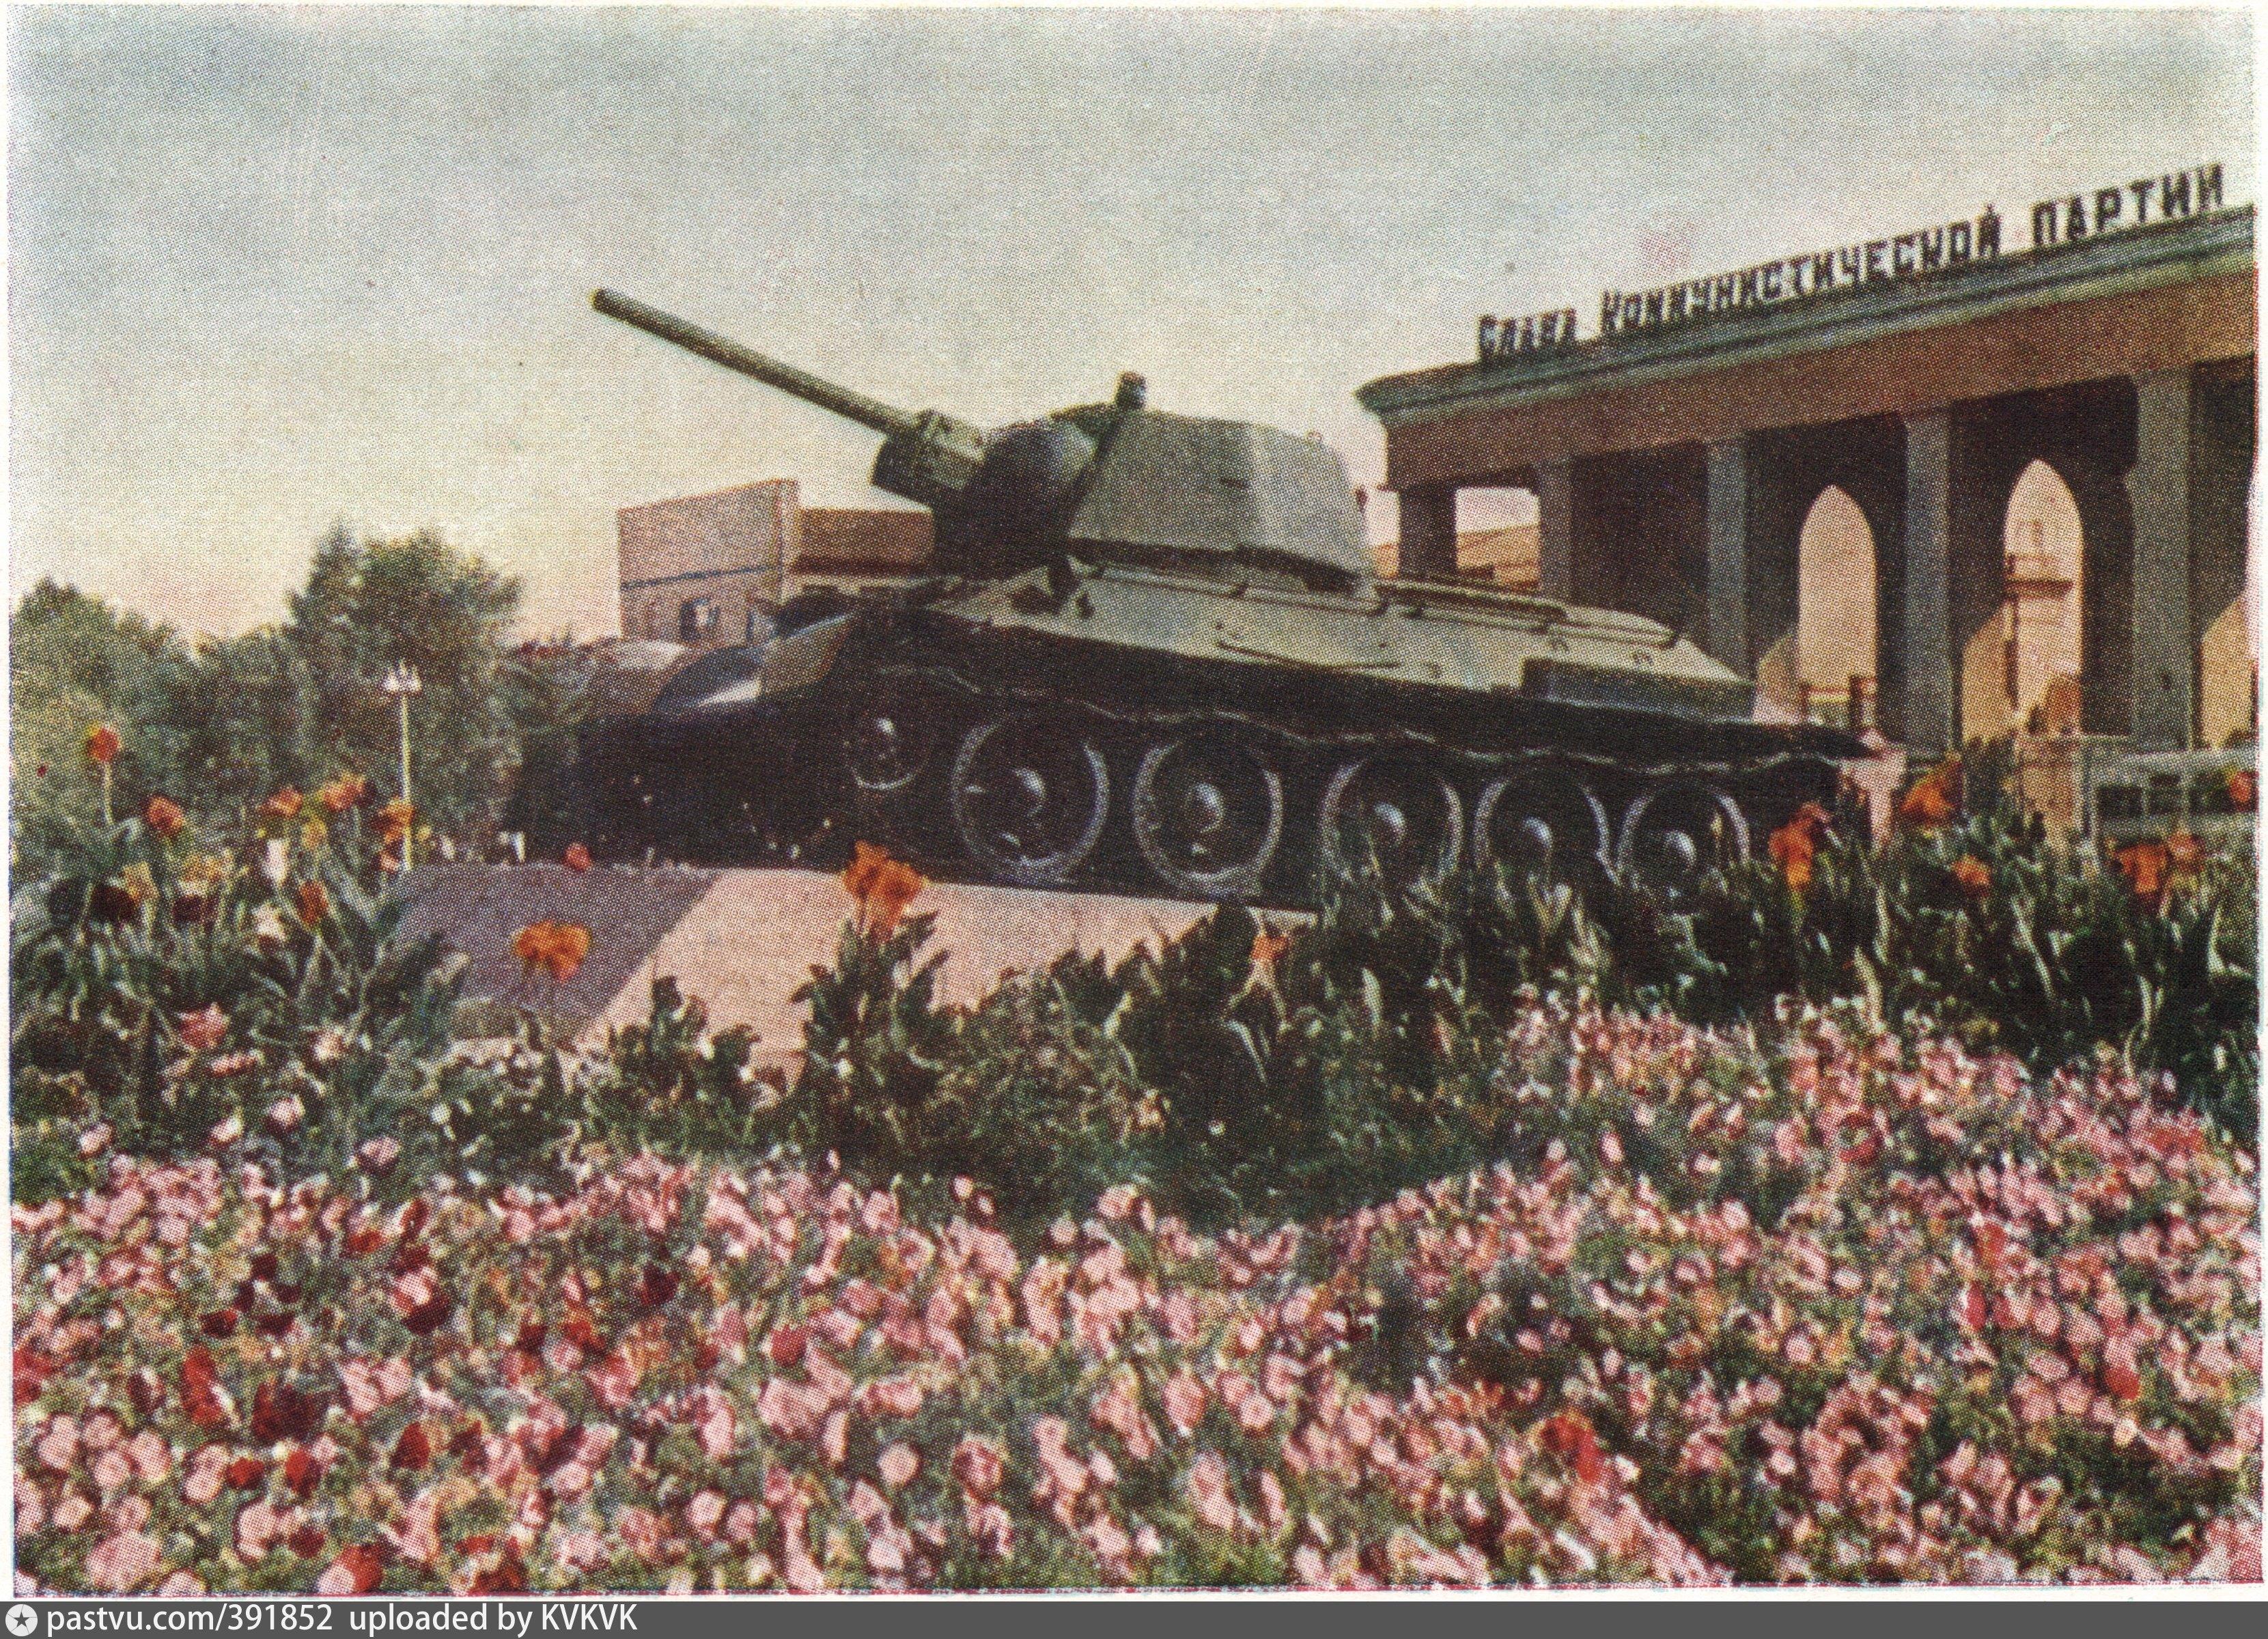 фото танка на стз г волгоград еще ему